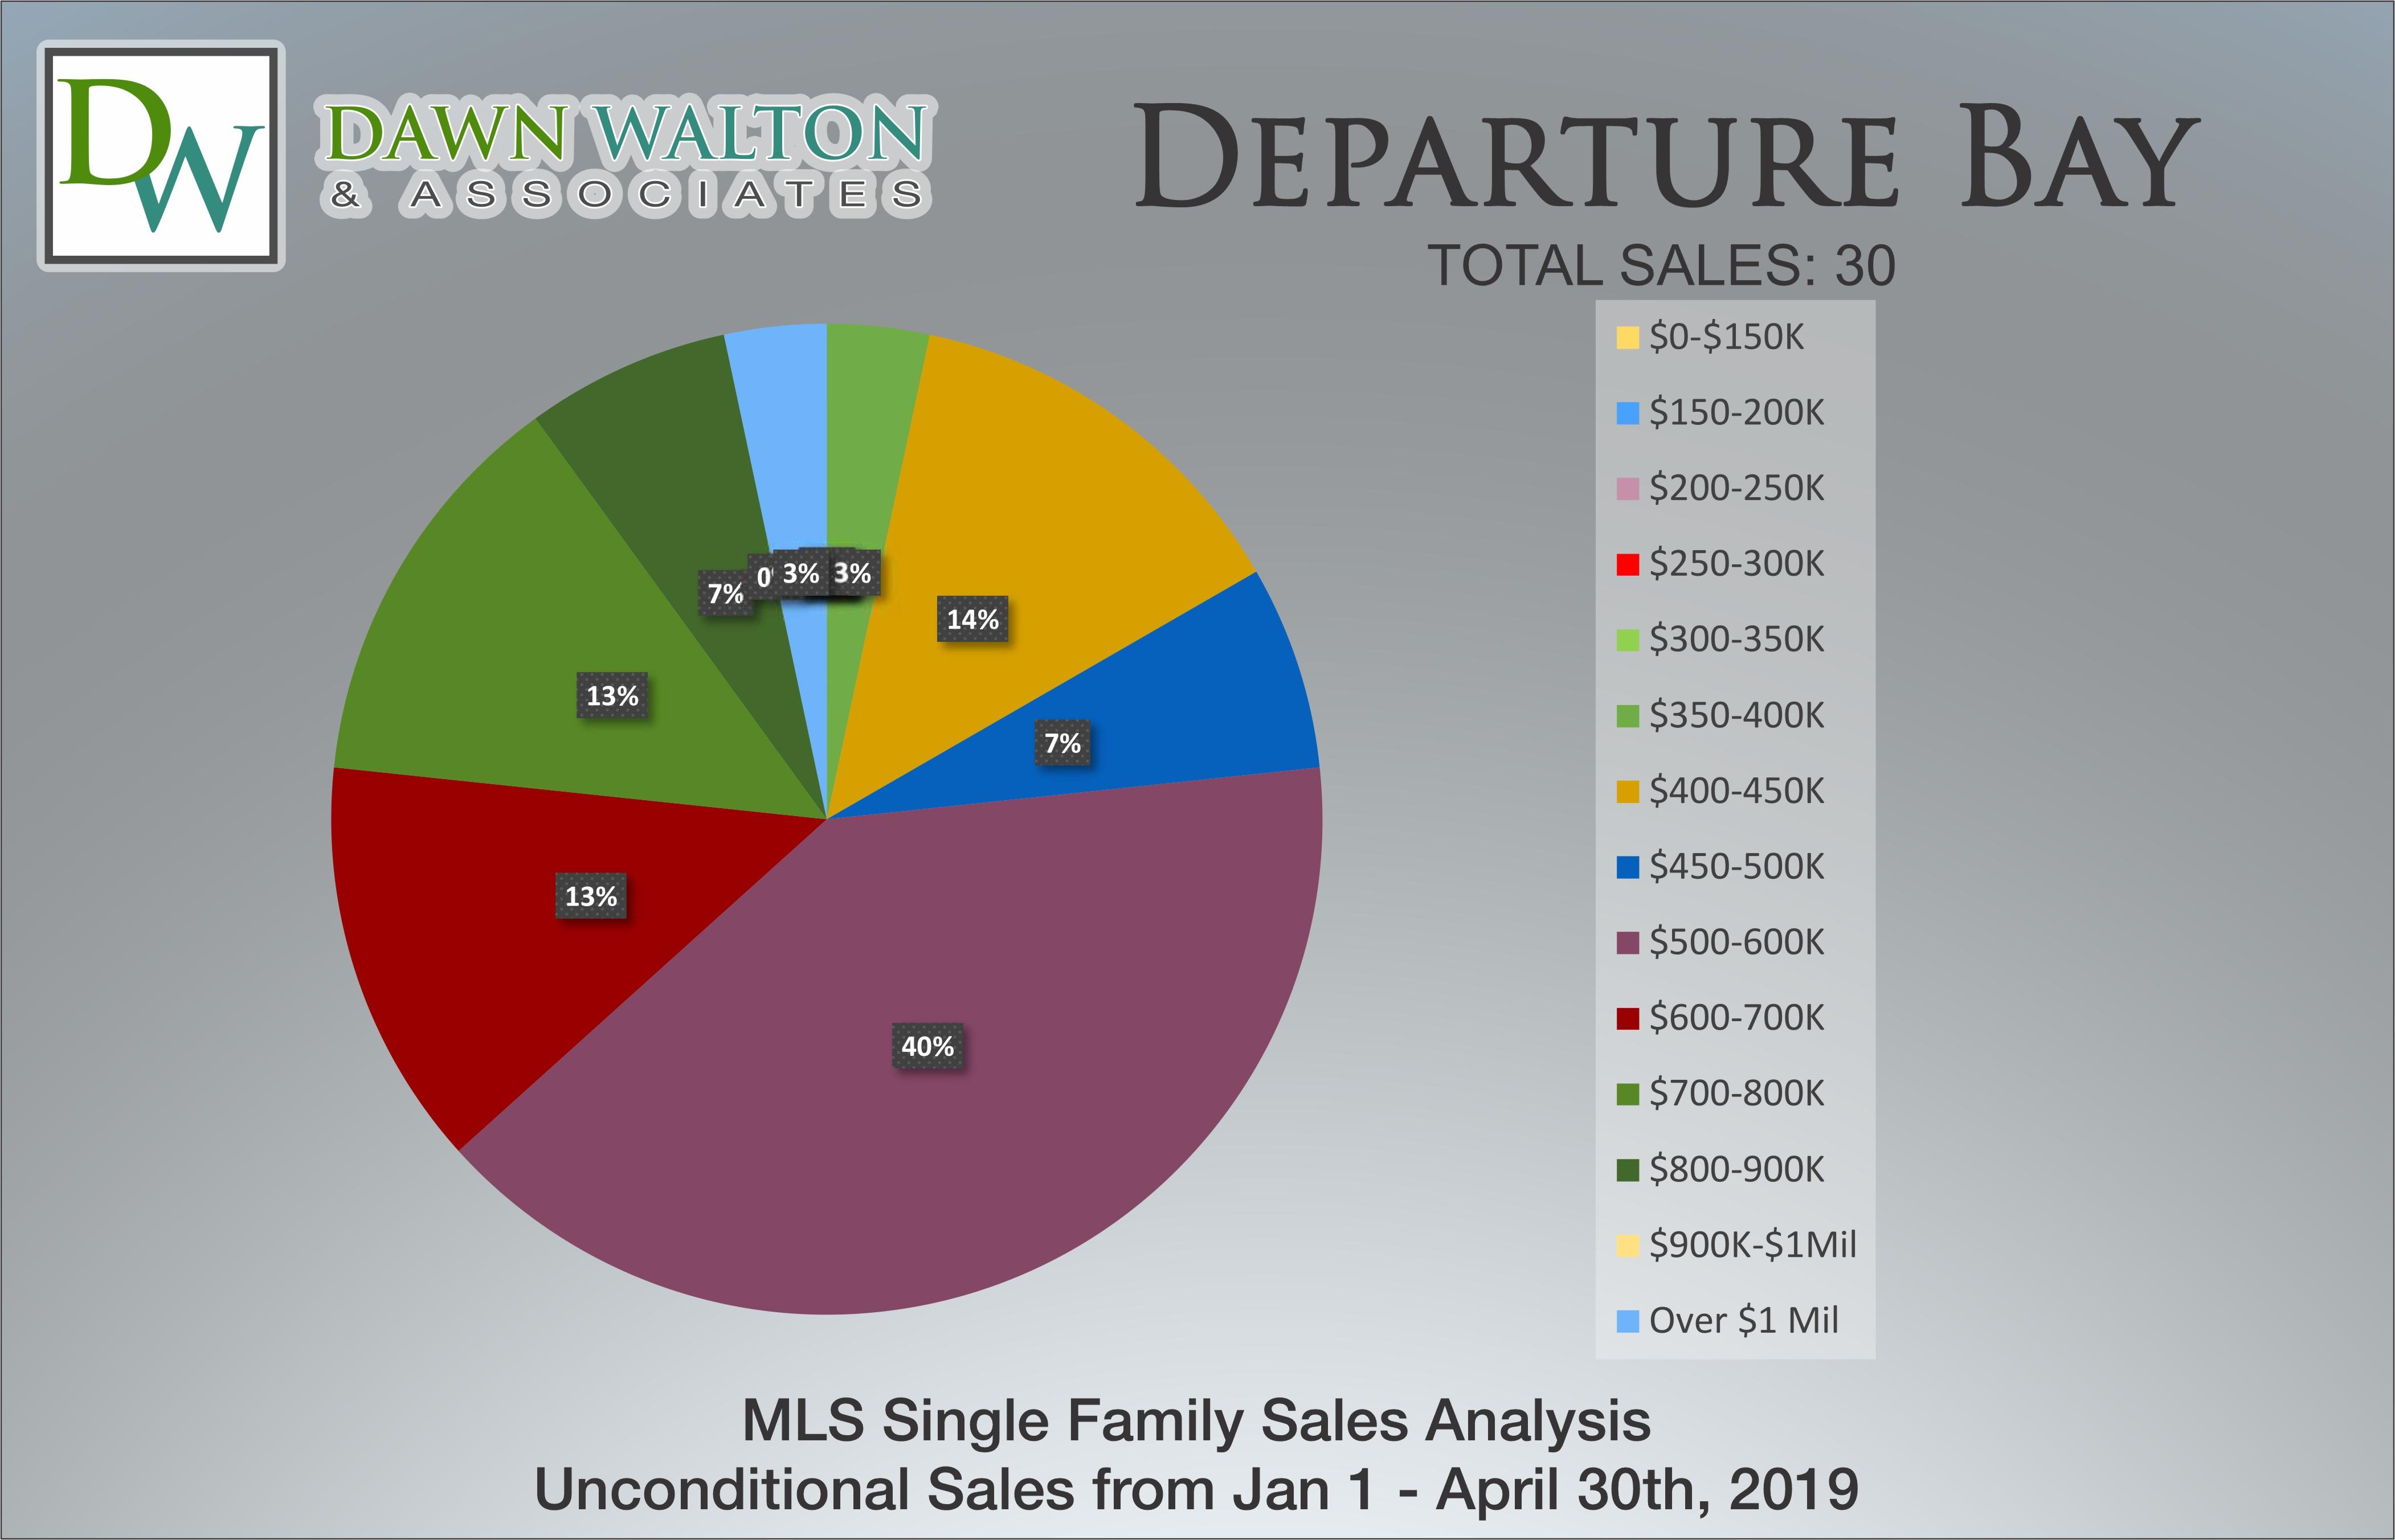 Departure Bay Real Estate Market Stats Price Percentage Jan 1 - April 30, 2019 - Nanaimo Realtor Dawn Walton